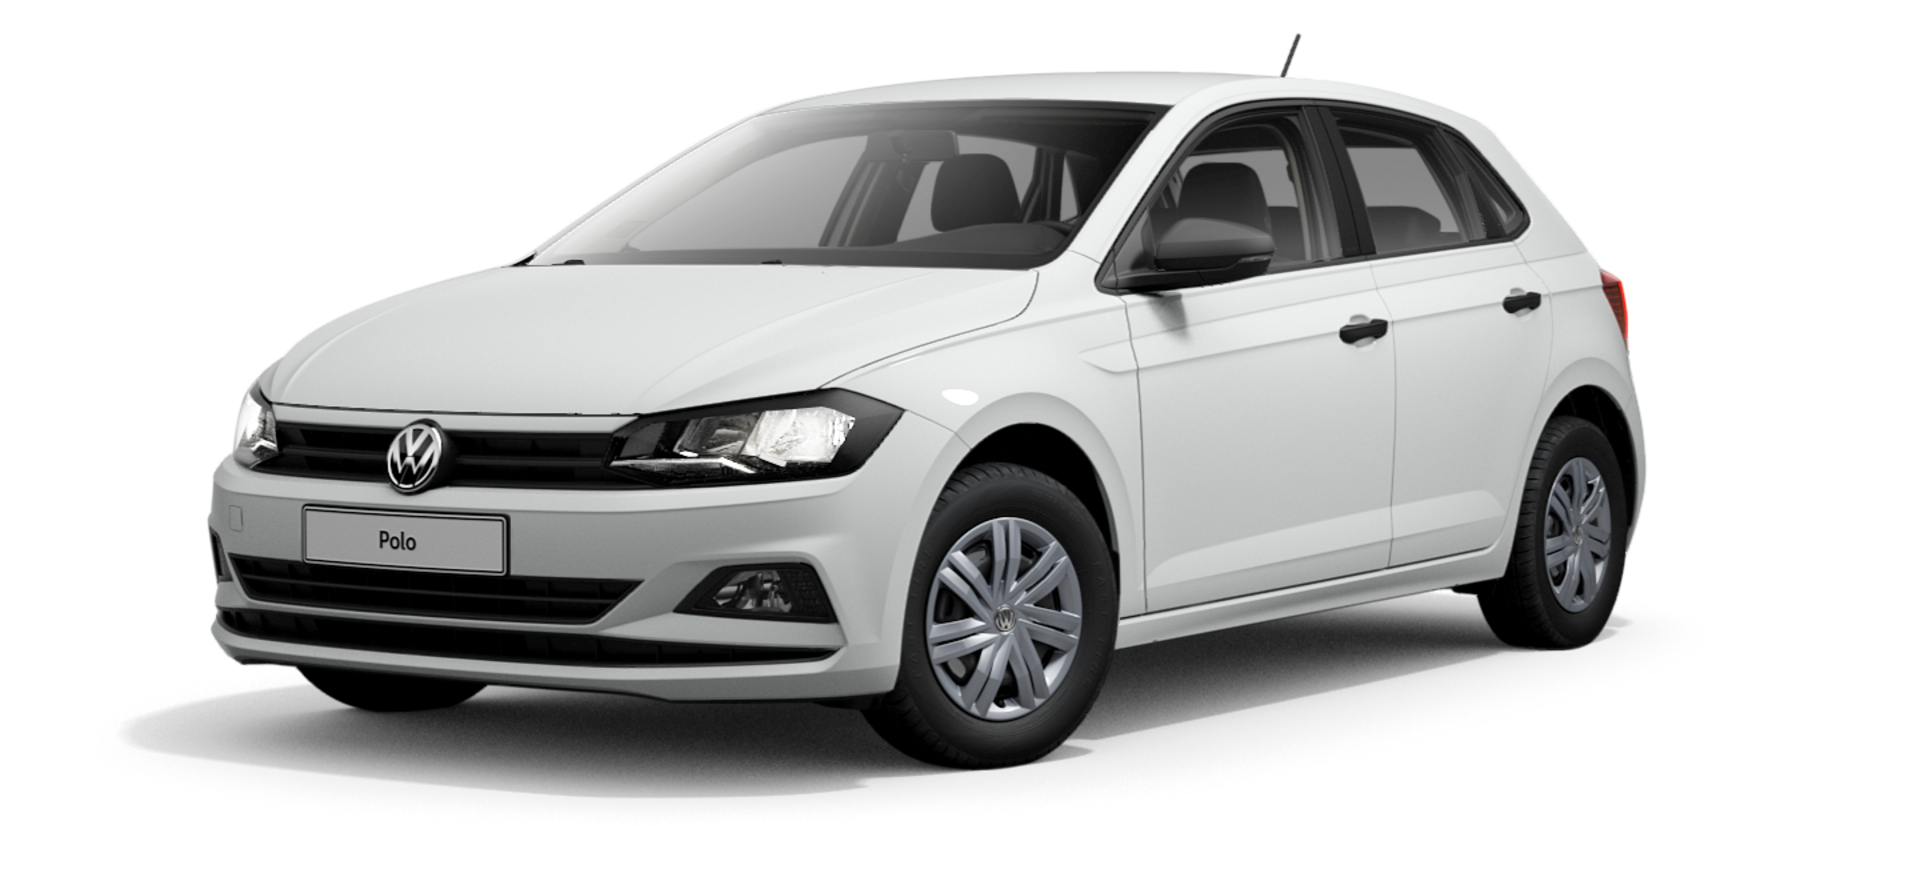 PoloTrendline 1.0  4 usi / 80 CP/59 kW / 1.0l / Manuala, 5 trepte / 4-usi : Volkswagen Polo